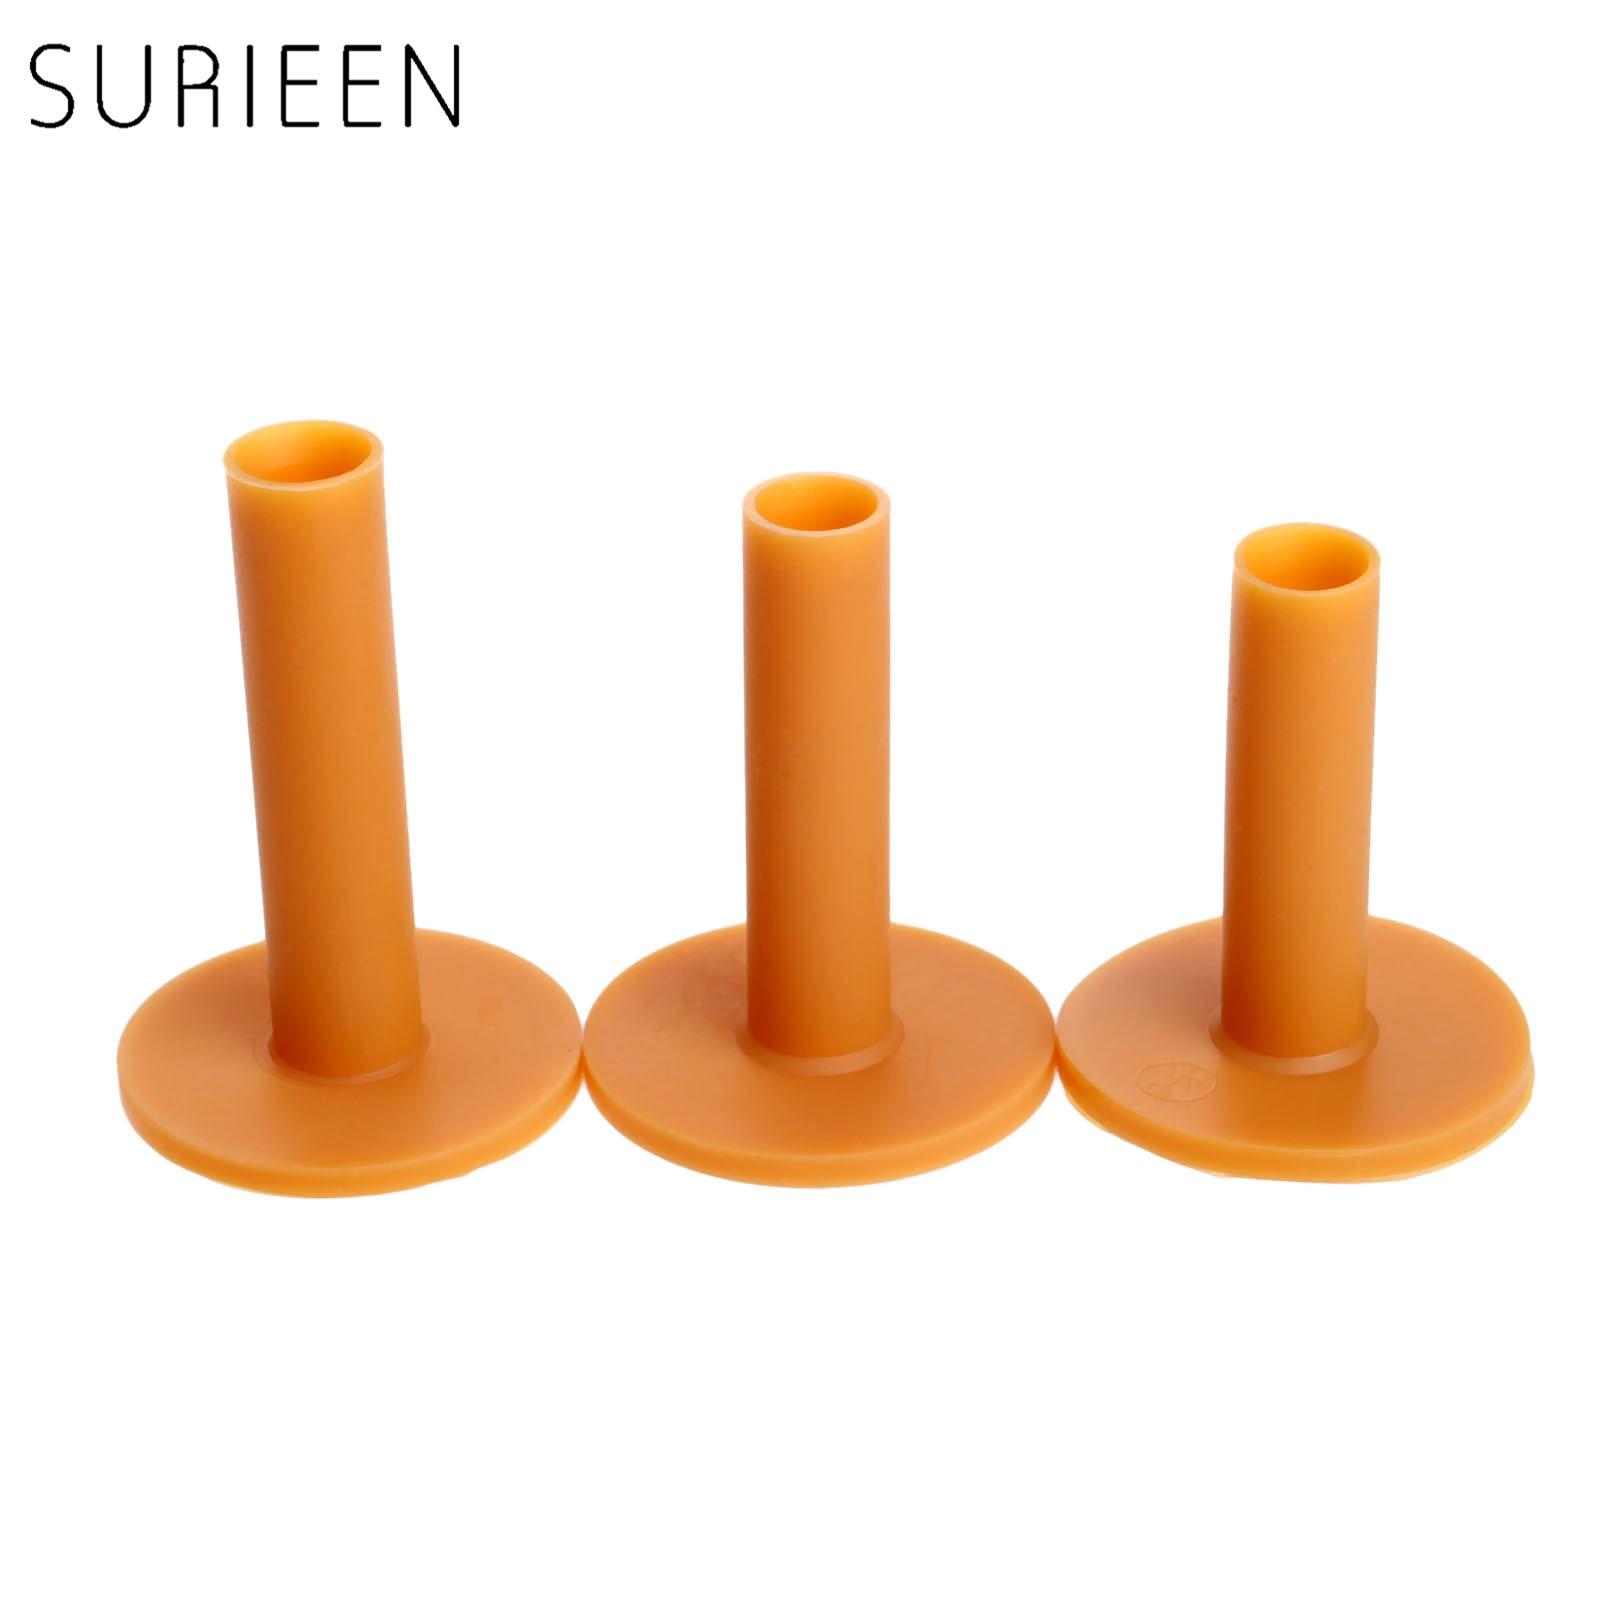 SURIEEN 3Pcs Rubber Golf Tees Holder 60mm/70mm/80mm Training Practice Tee Range Driving Practice Mat Golves Ball Hole Holder Set